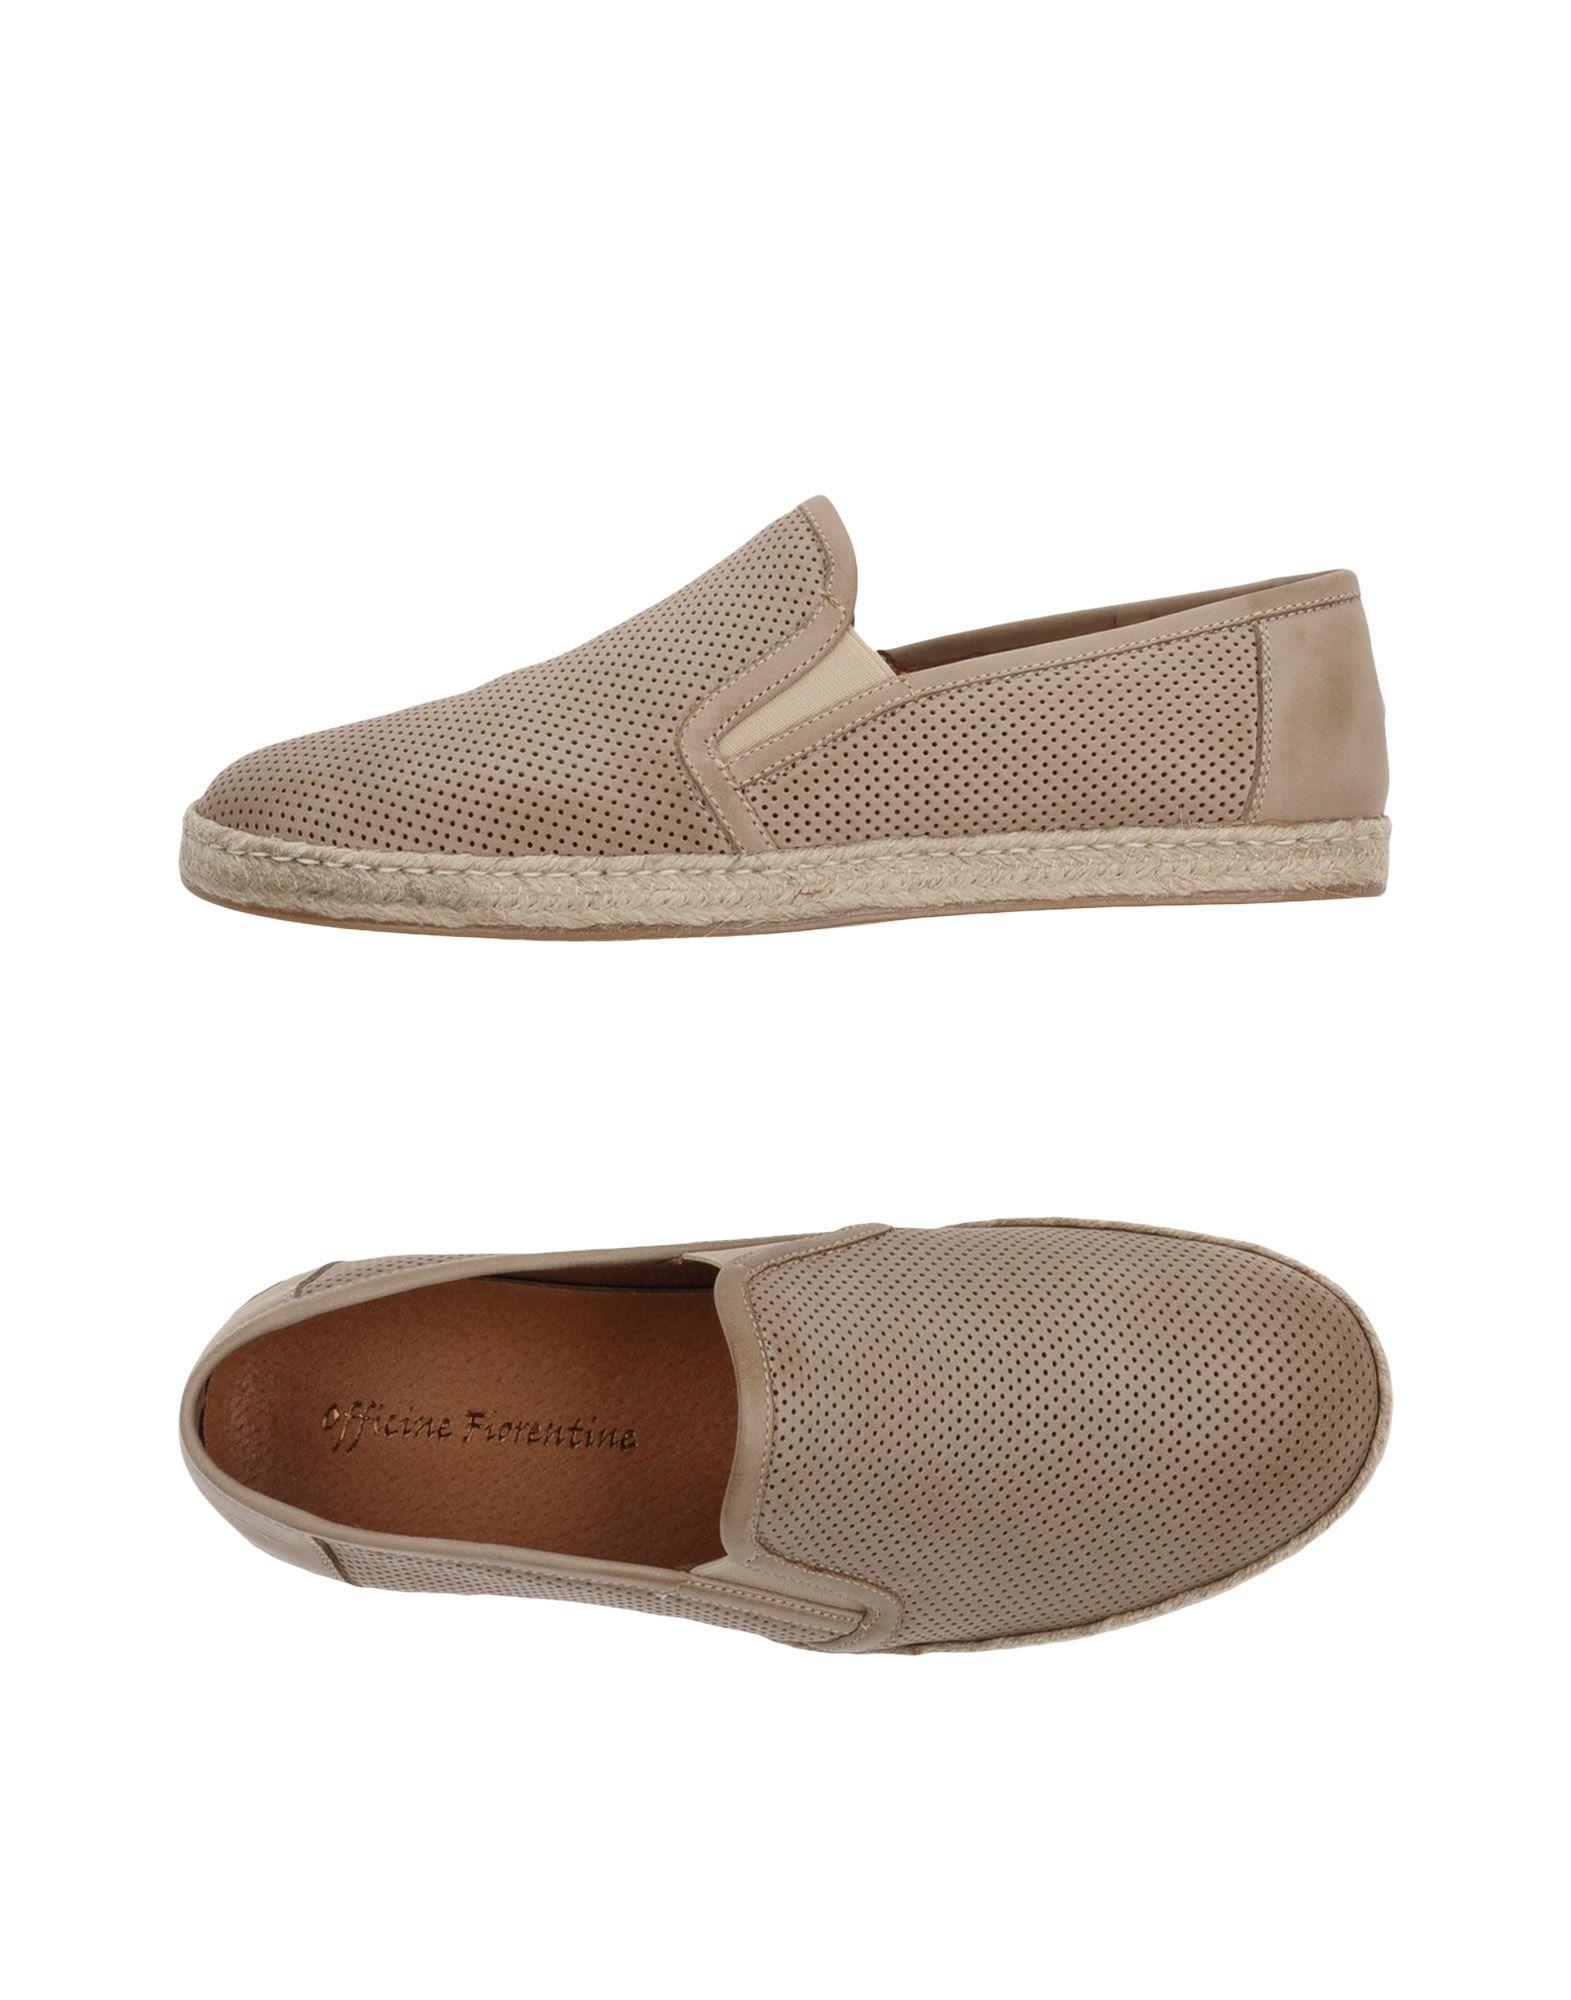 Rabatt echte  Schuhe Officine Fiorentine Espadrilles Herren  echte 11361607NP a7f9bb